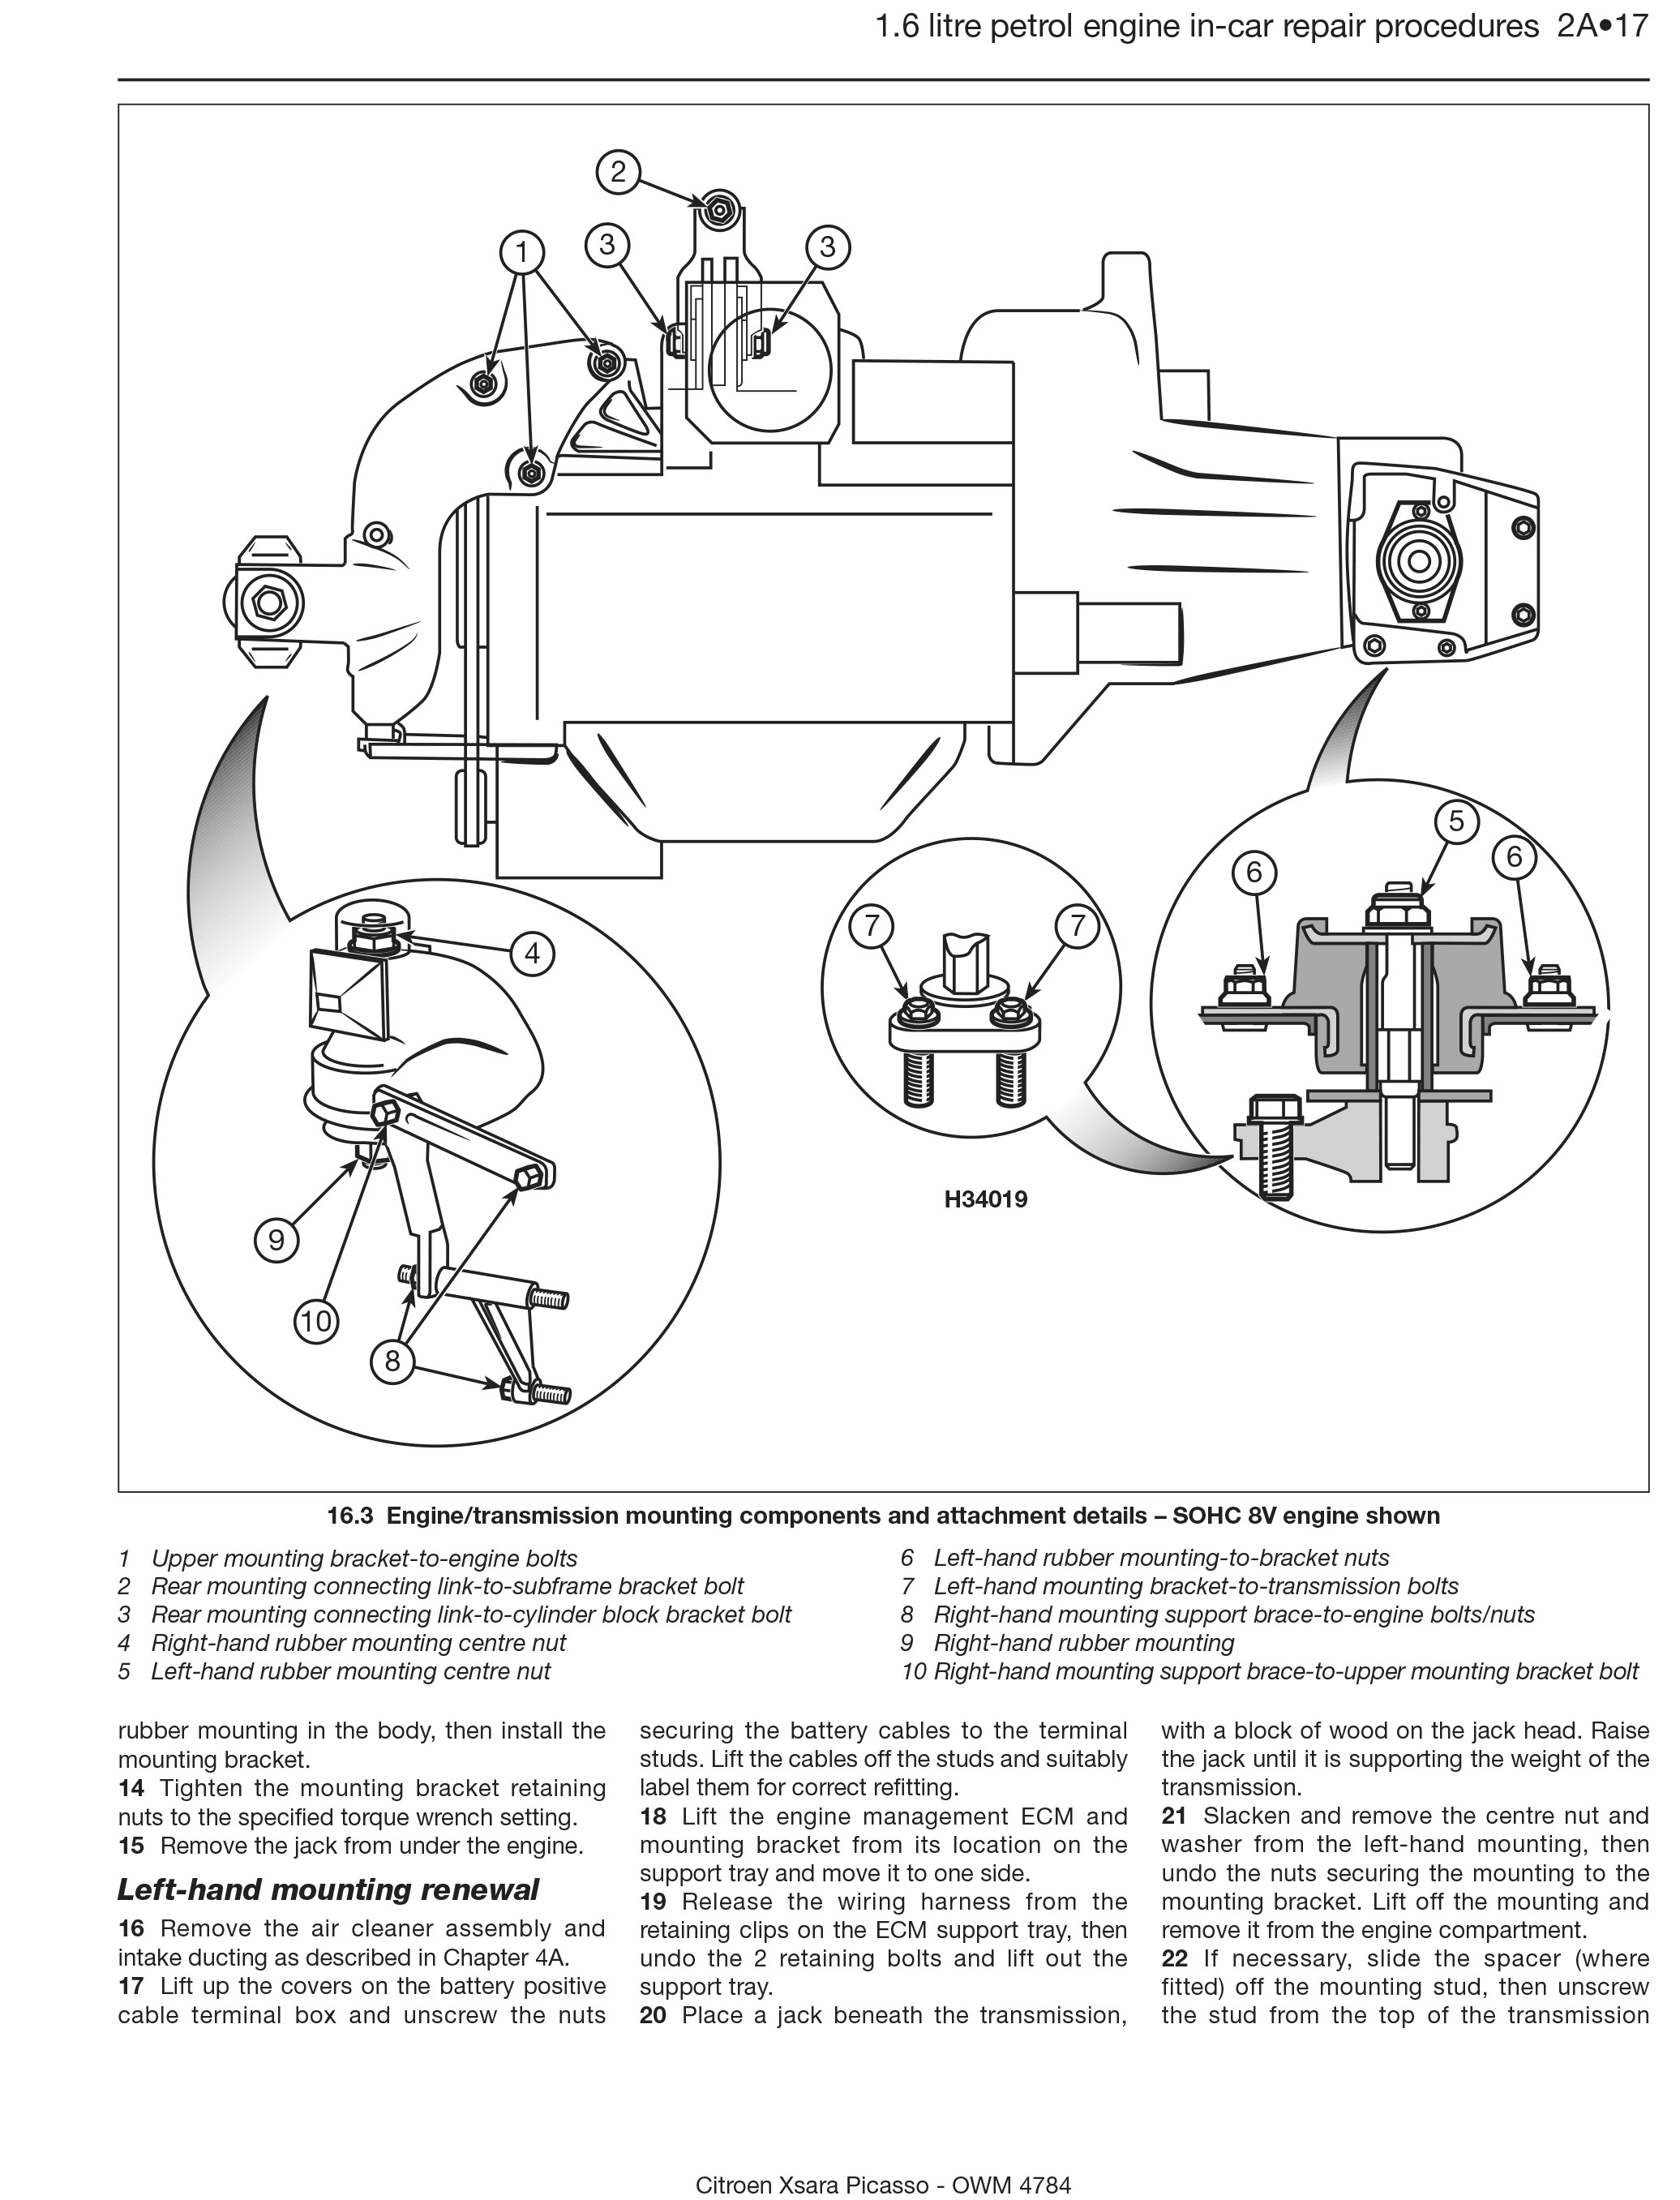 Citroen Xsara Wiring Diagram Download